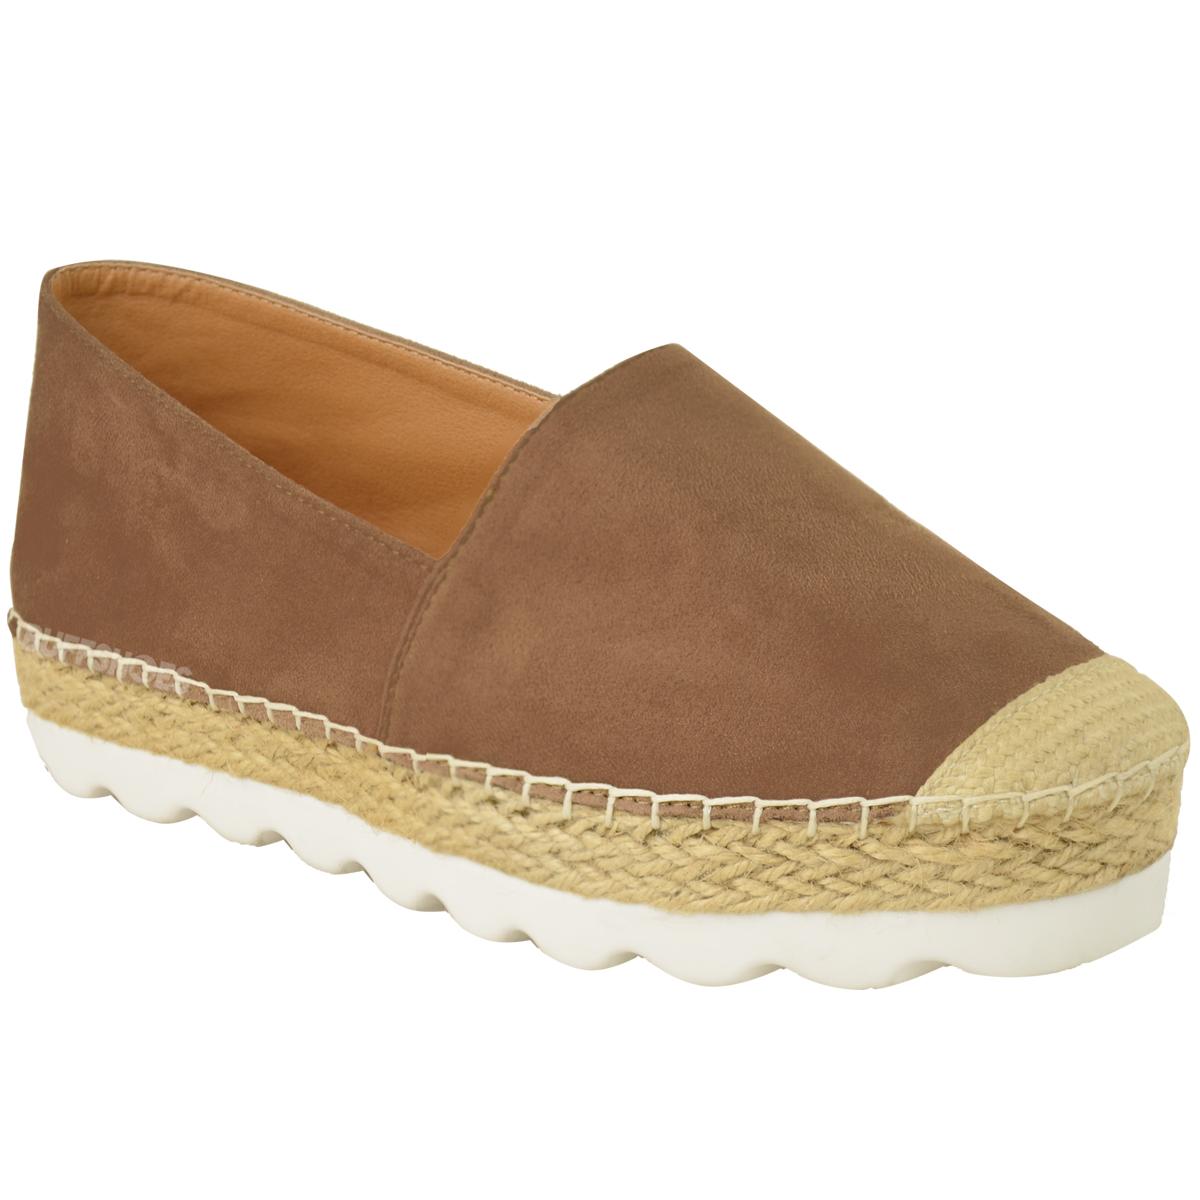 New Clothes Shoes Amp Accessories Gt Men39s Shoes Gt Trainers